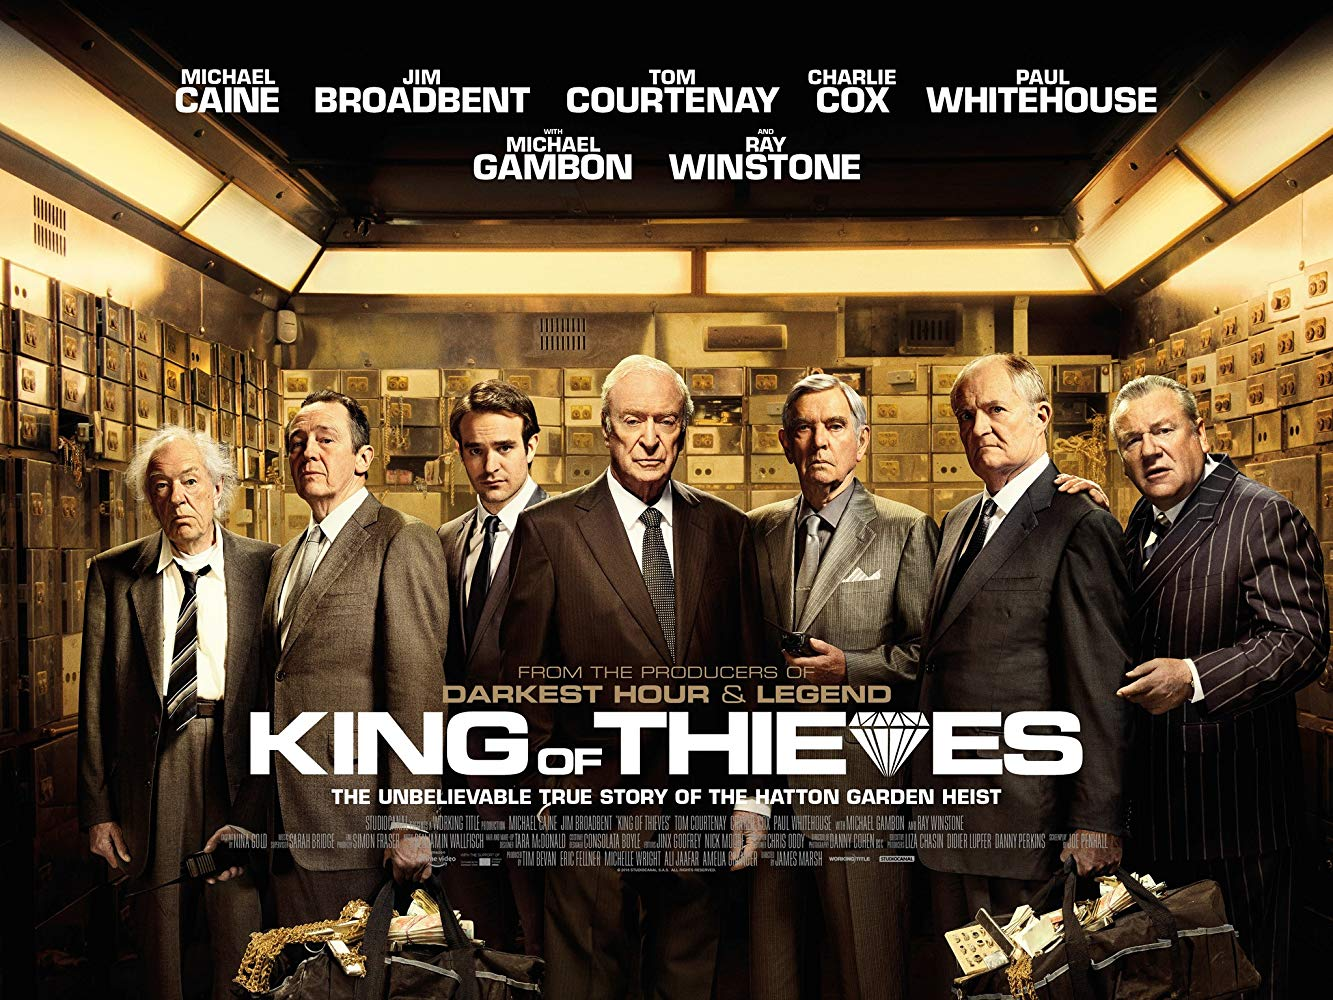 KingOfThieves.jpg